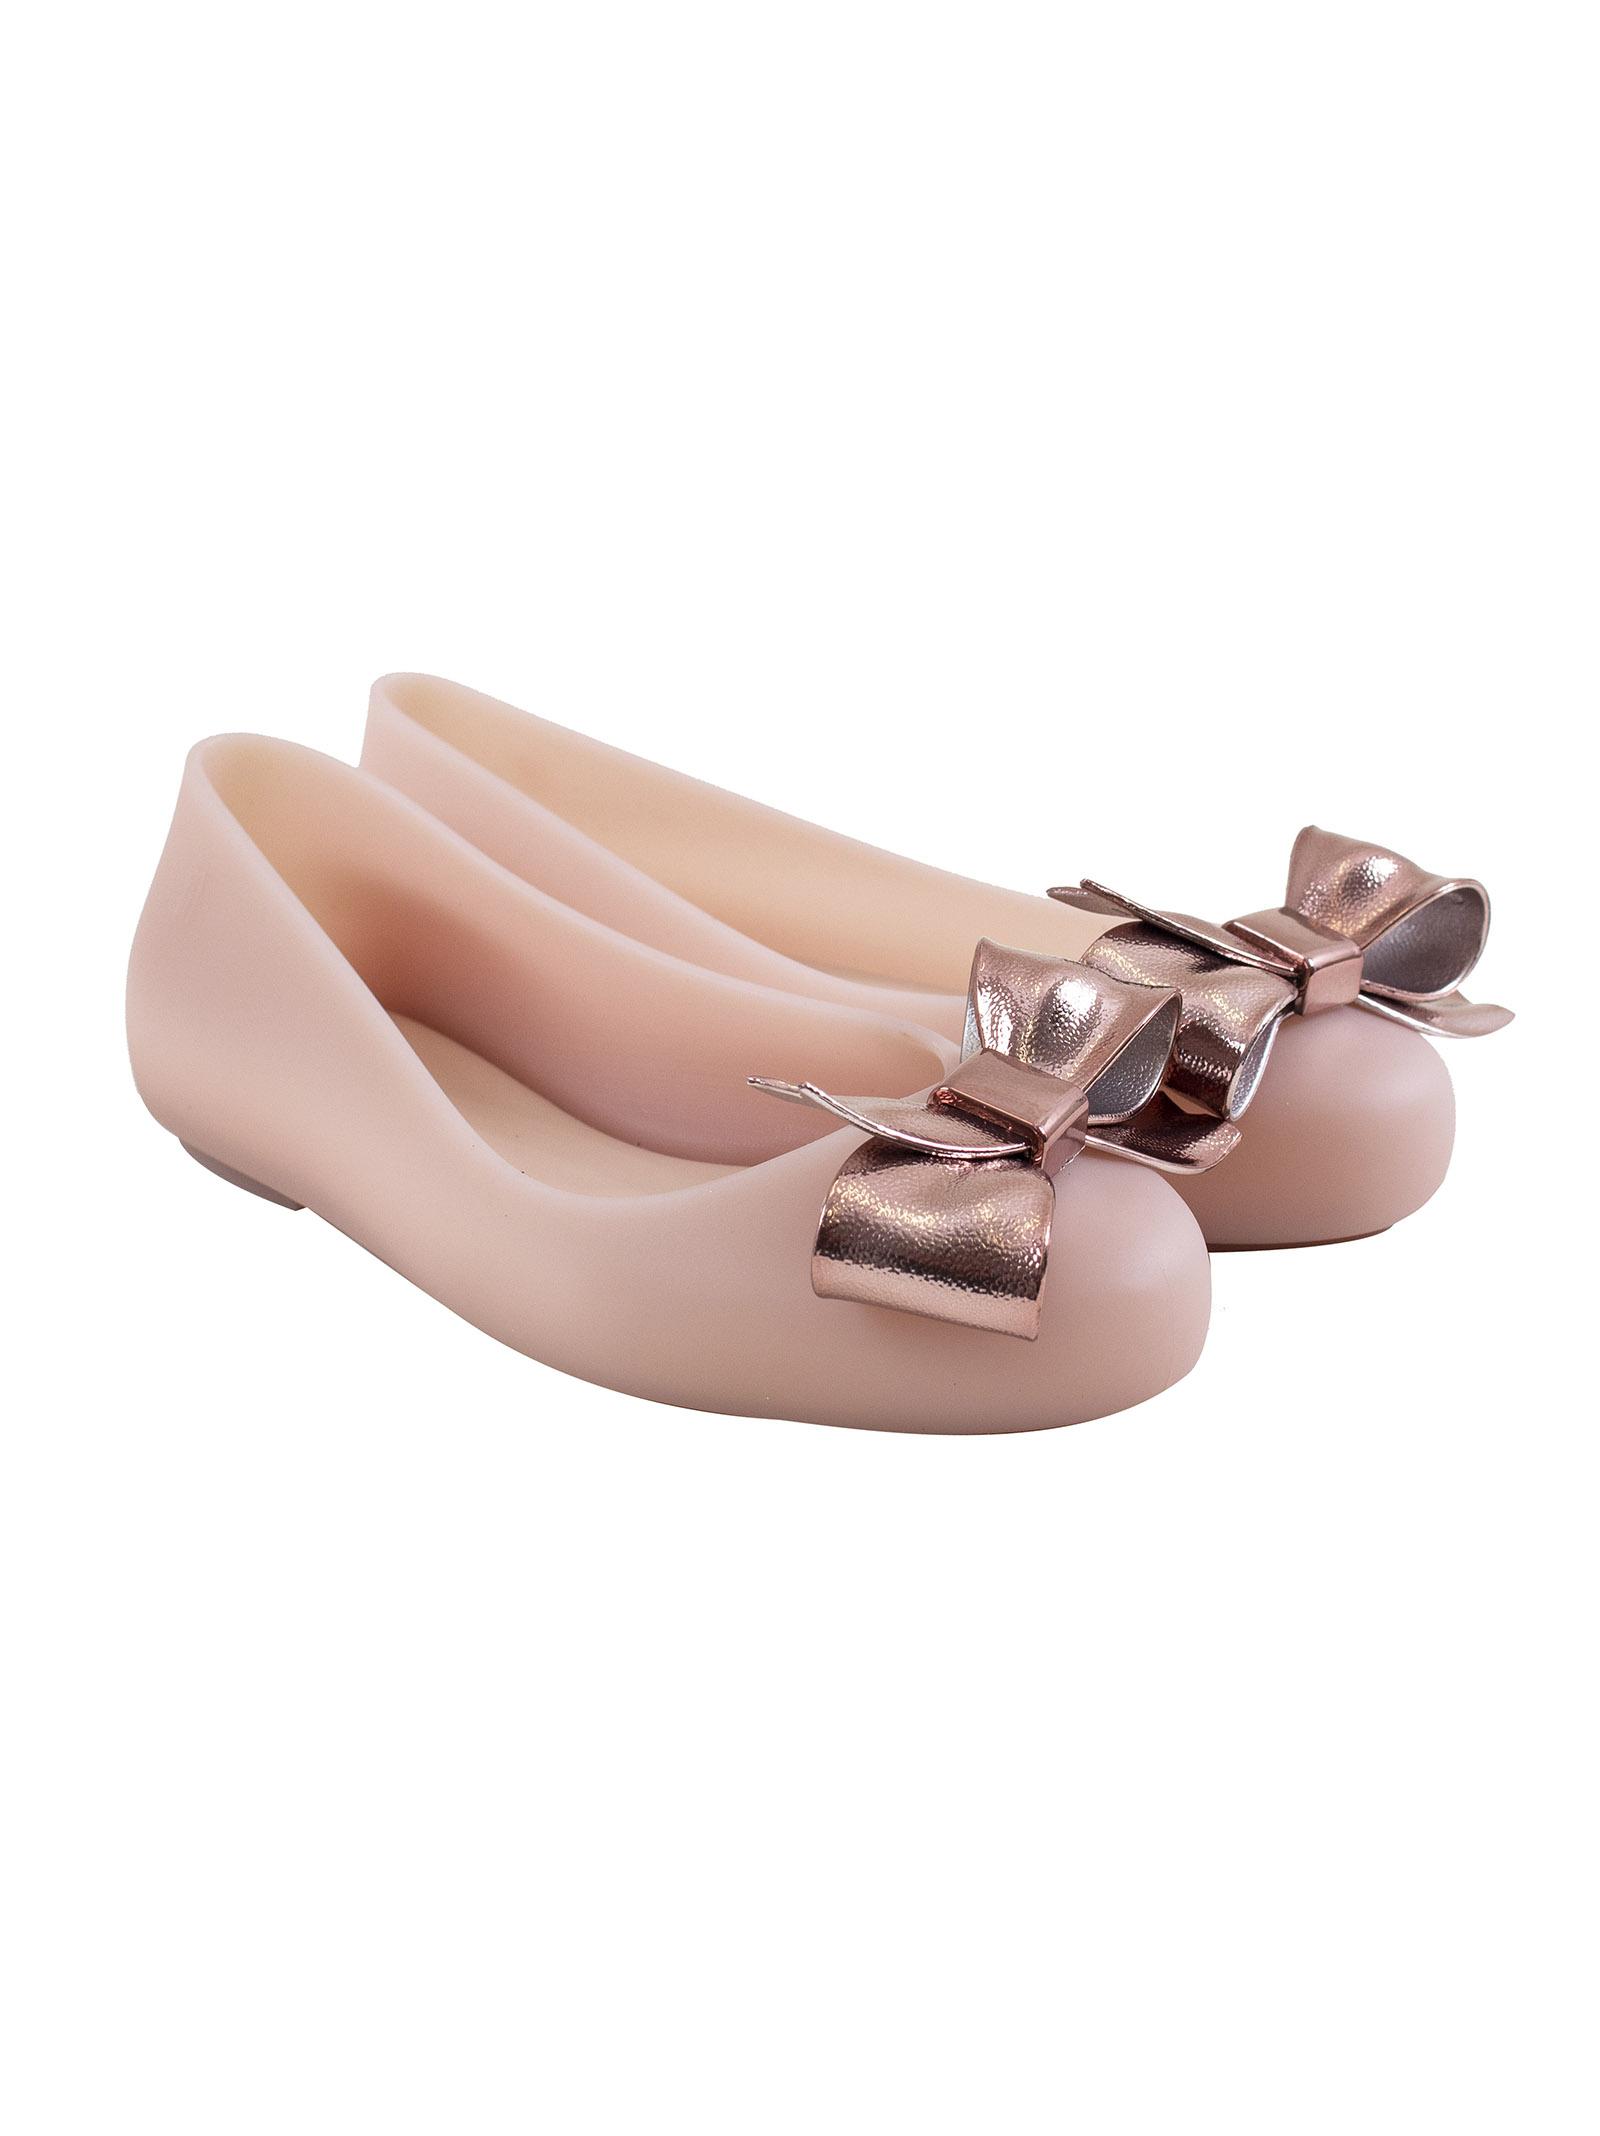 new product a10f4 cc448 Ballerina bambina con fiocco